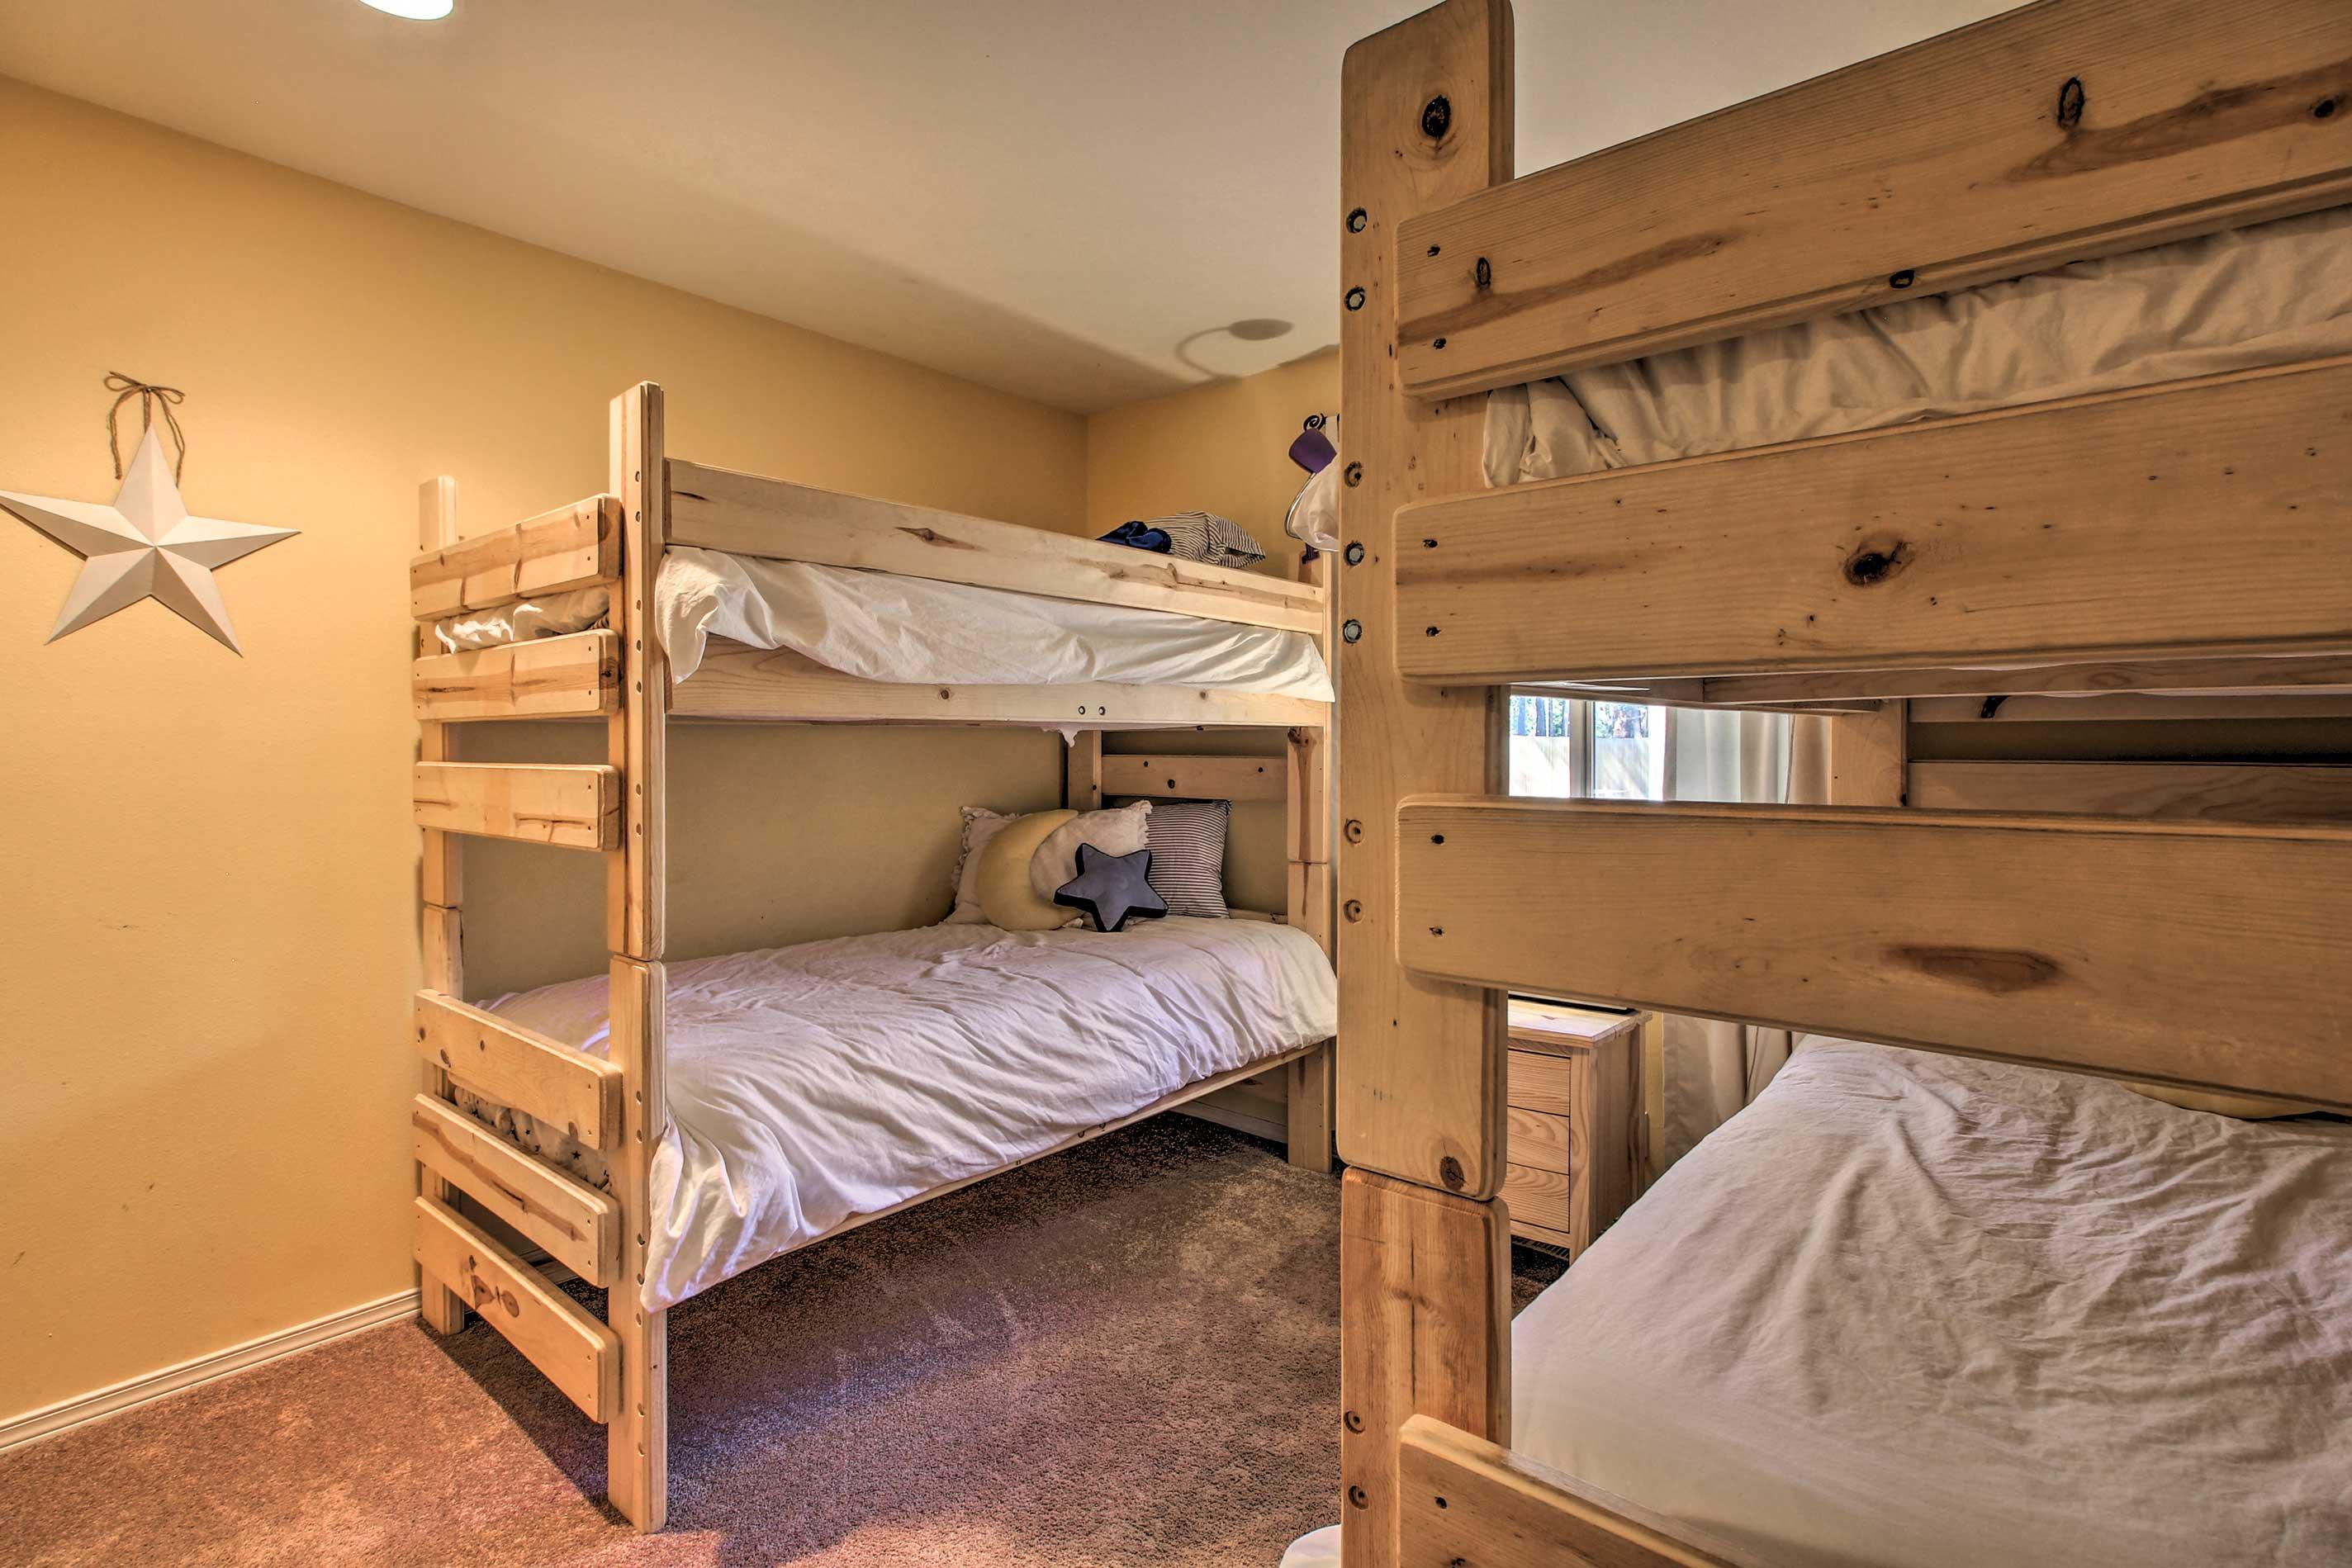 The third bedroom features 2 twin bunk beds.